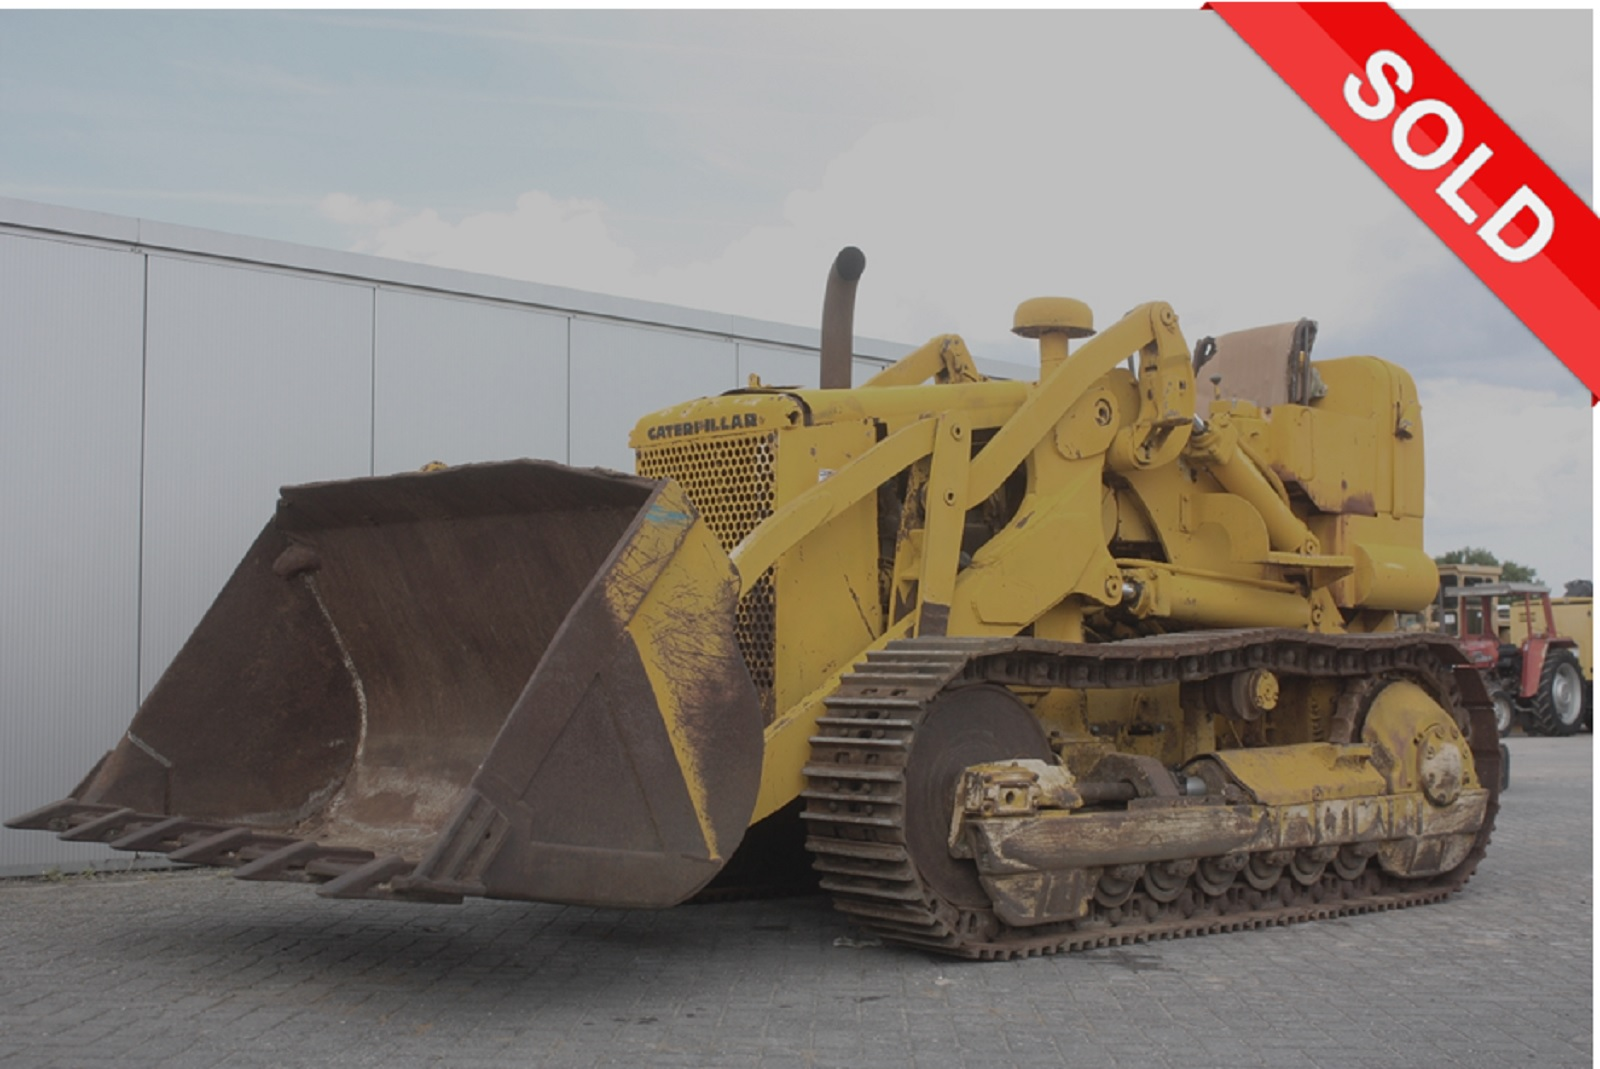 pale cingolate Caterpillar-955h-e02090-001